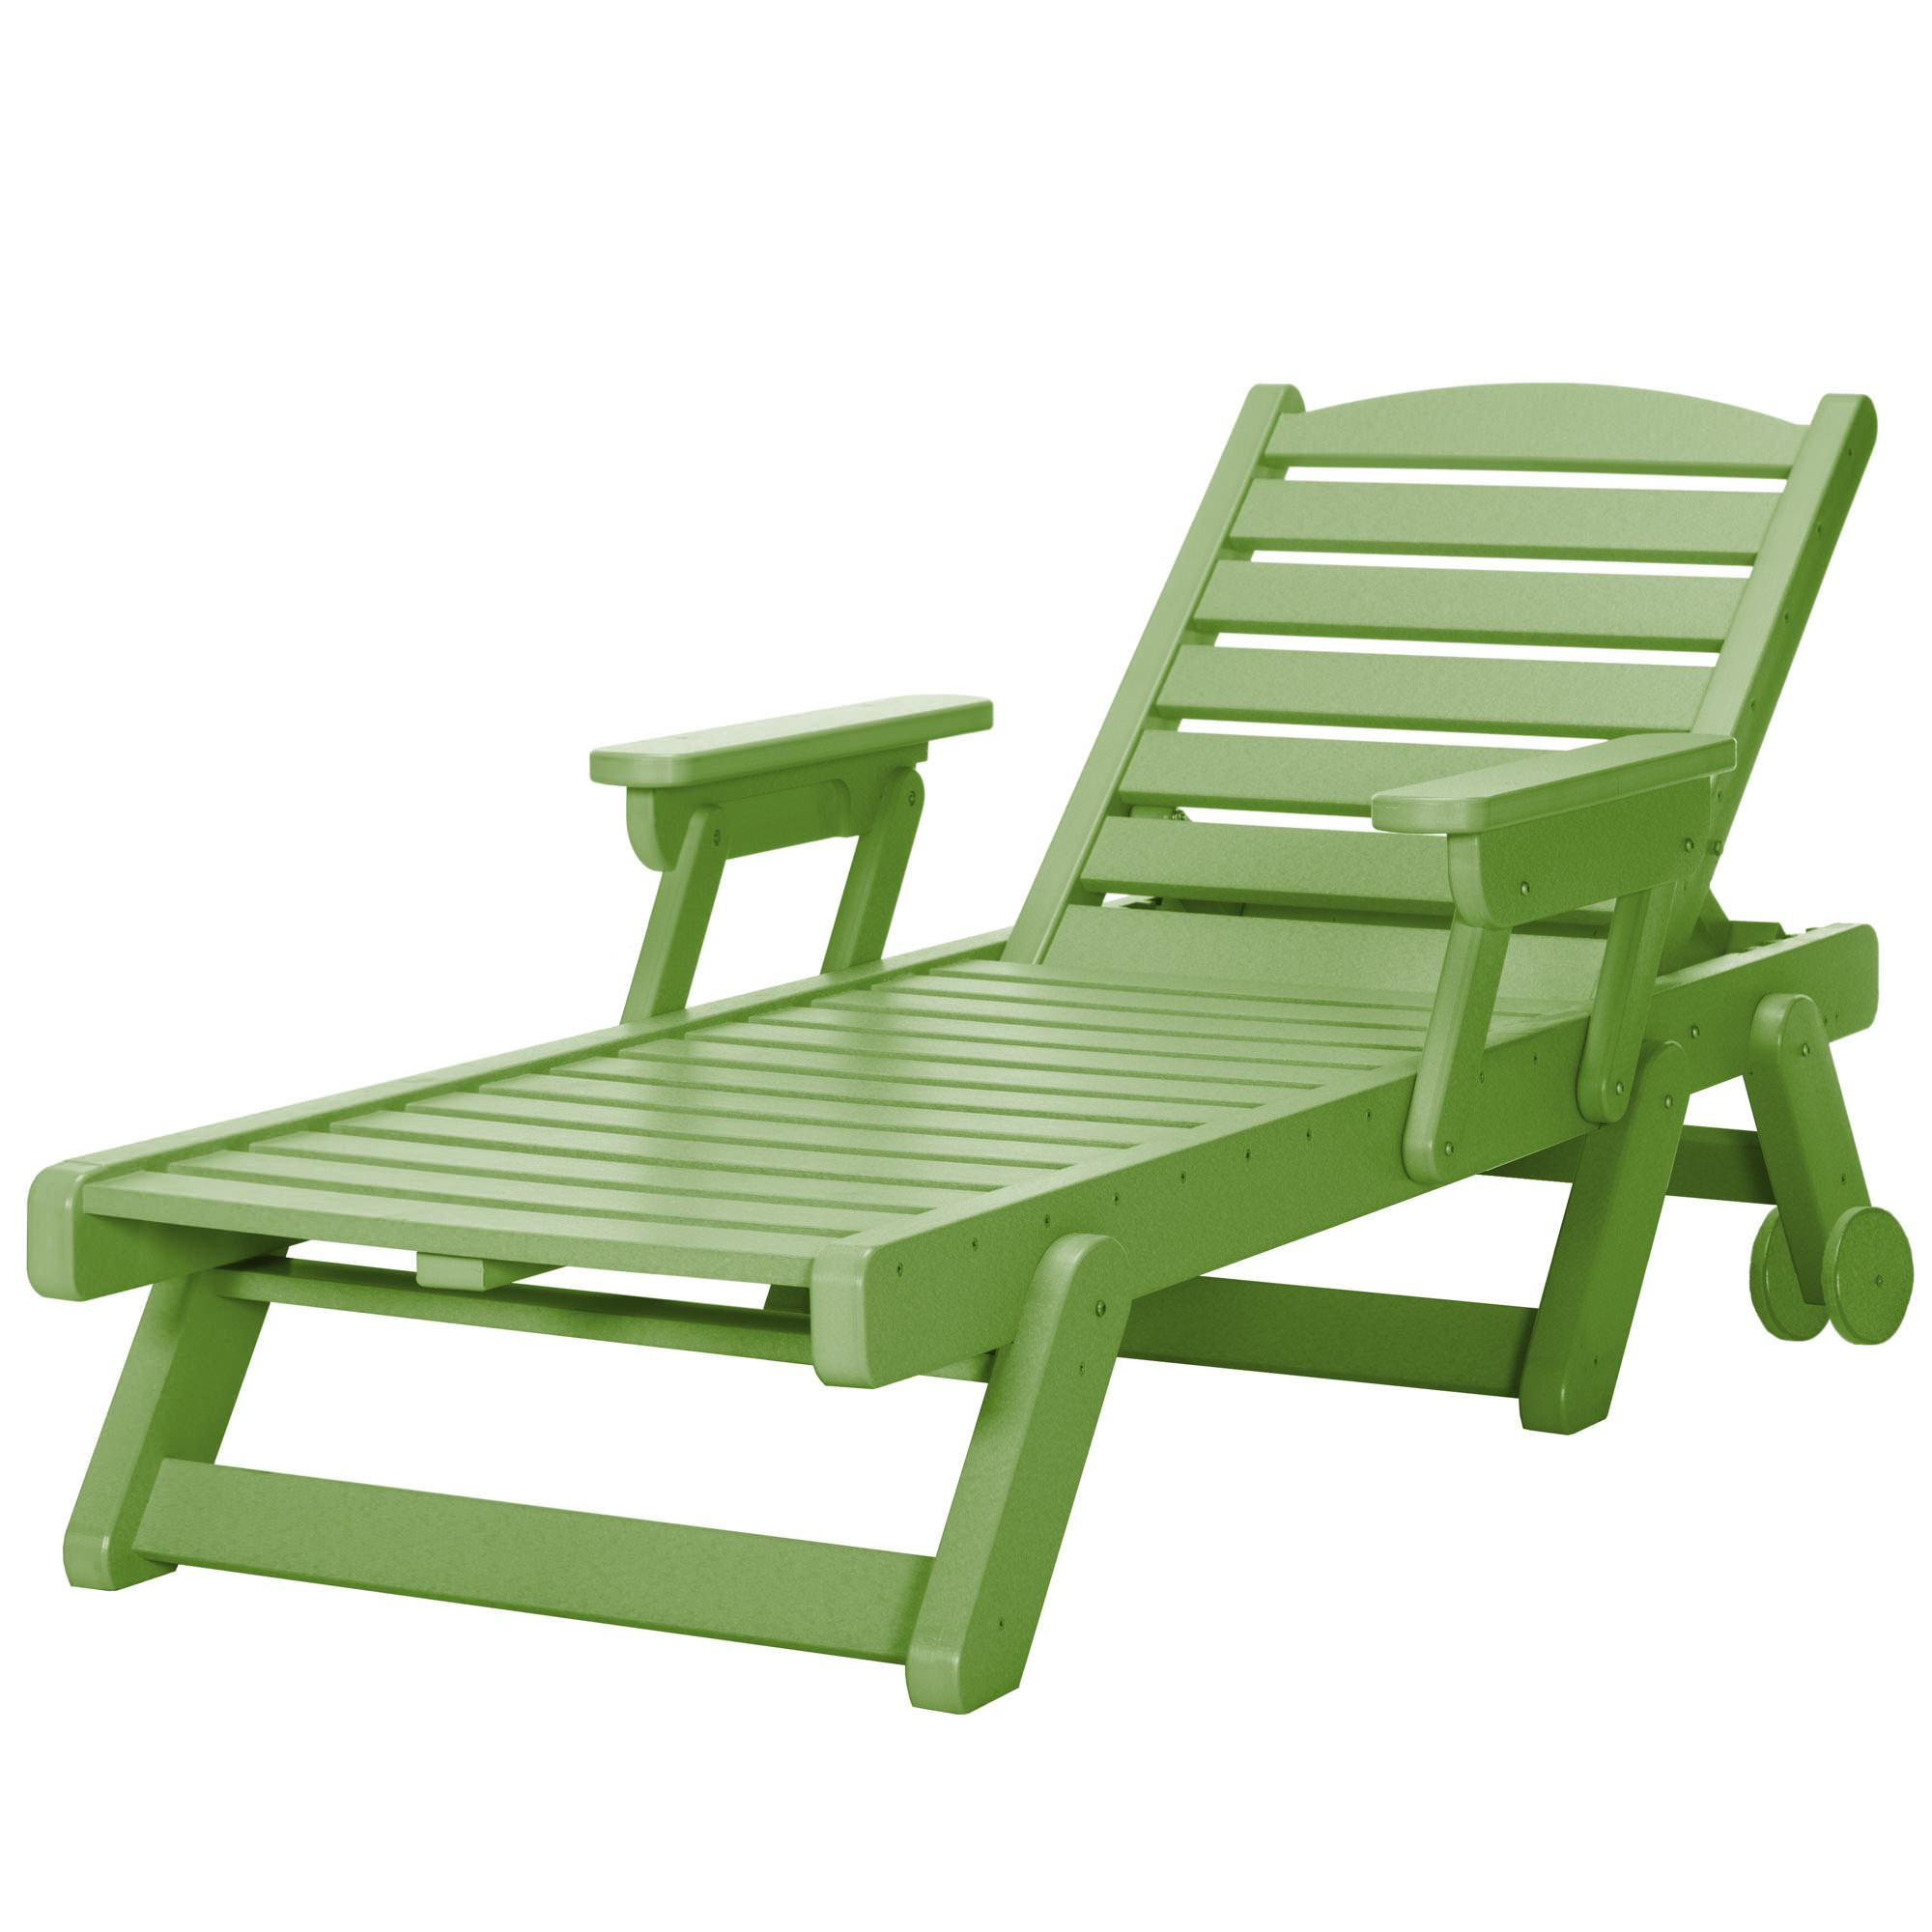 maldon green co h reviews uk j wayfair classics longue lounge chaise pdp furniture